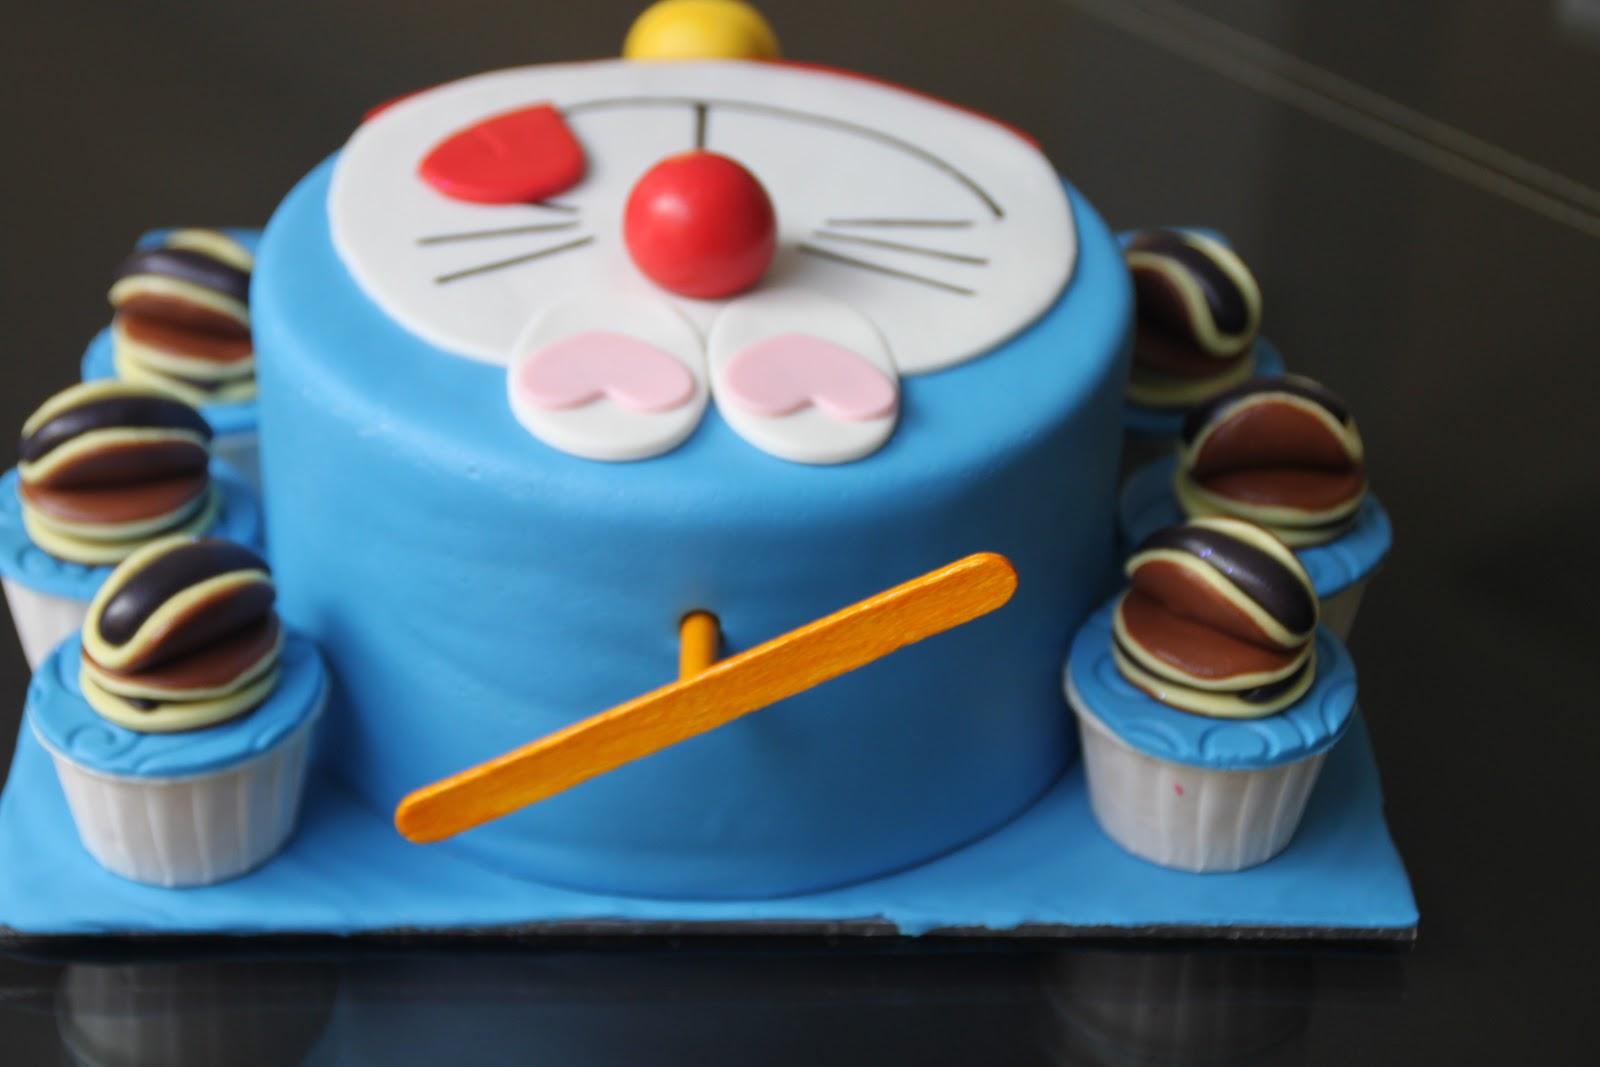 Celebrate with Cake!: Doraemon Cake with Cupcakes